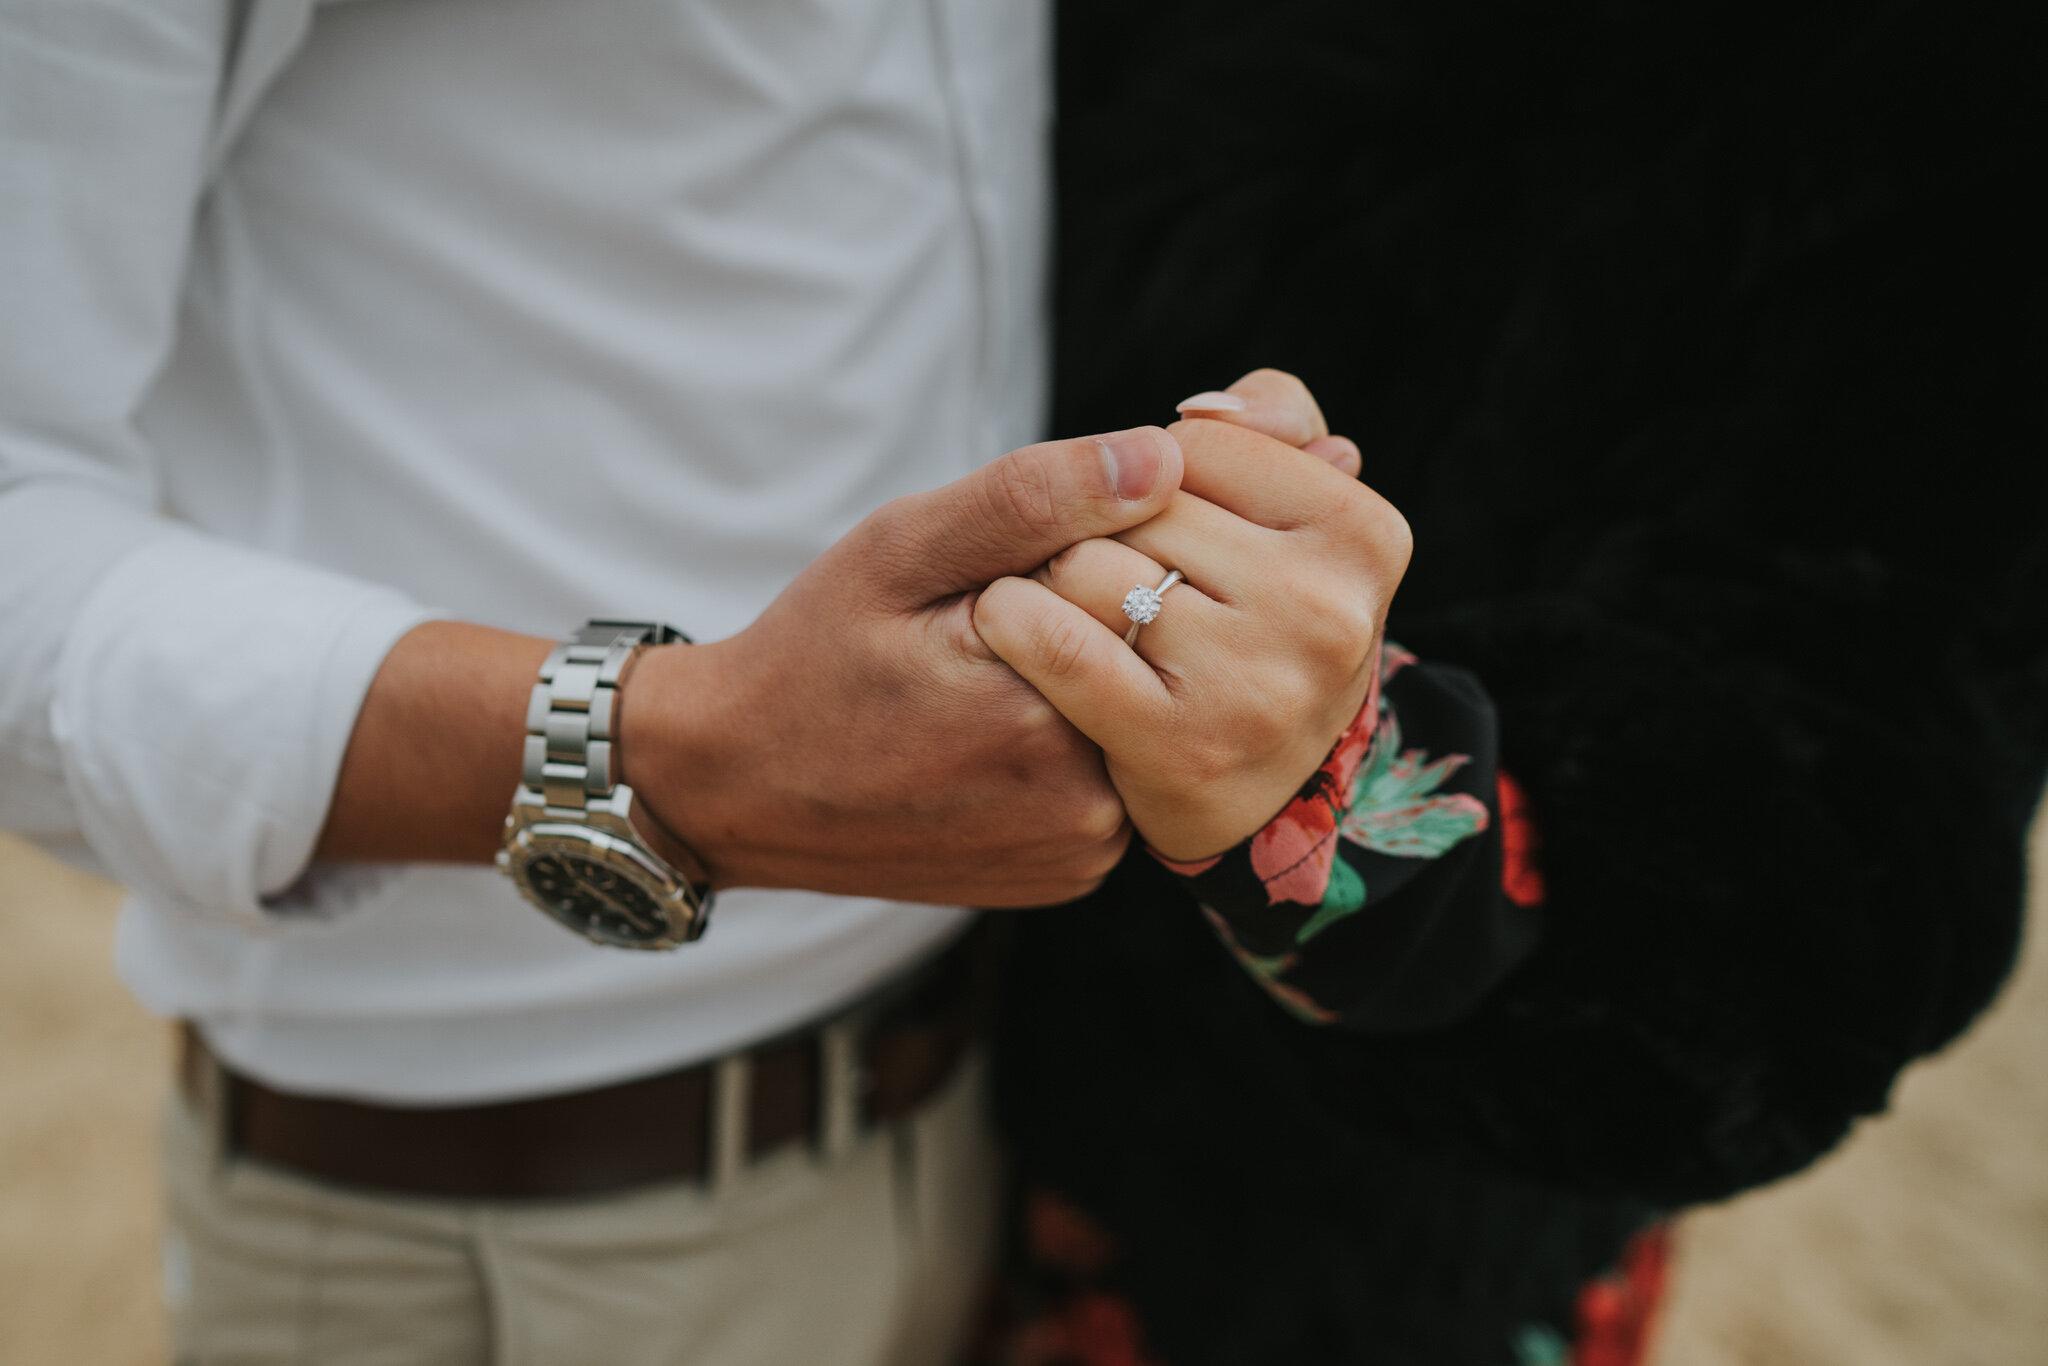 engagement-pre-wedding-hannah-michael-cudmore-grove-east-mersea-grace-elizabeth-colchester-essex-devon-suffolk-and-norfolk-alternative-wedding-and-family-photographer (7 of 51).jpg